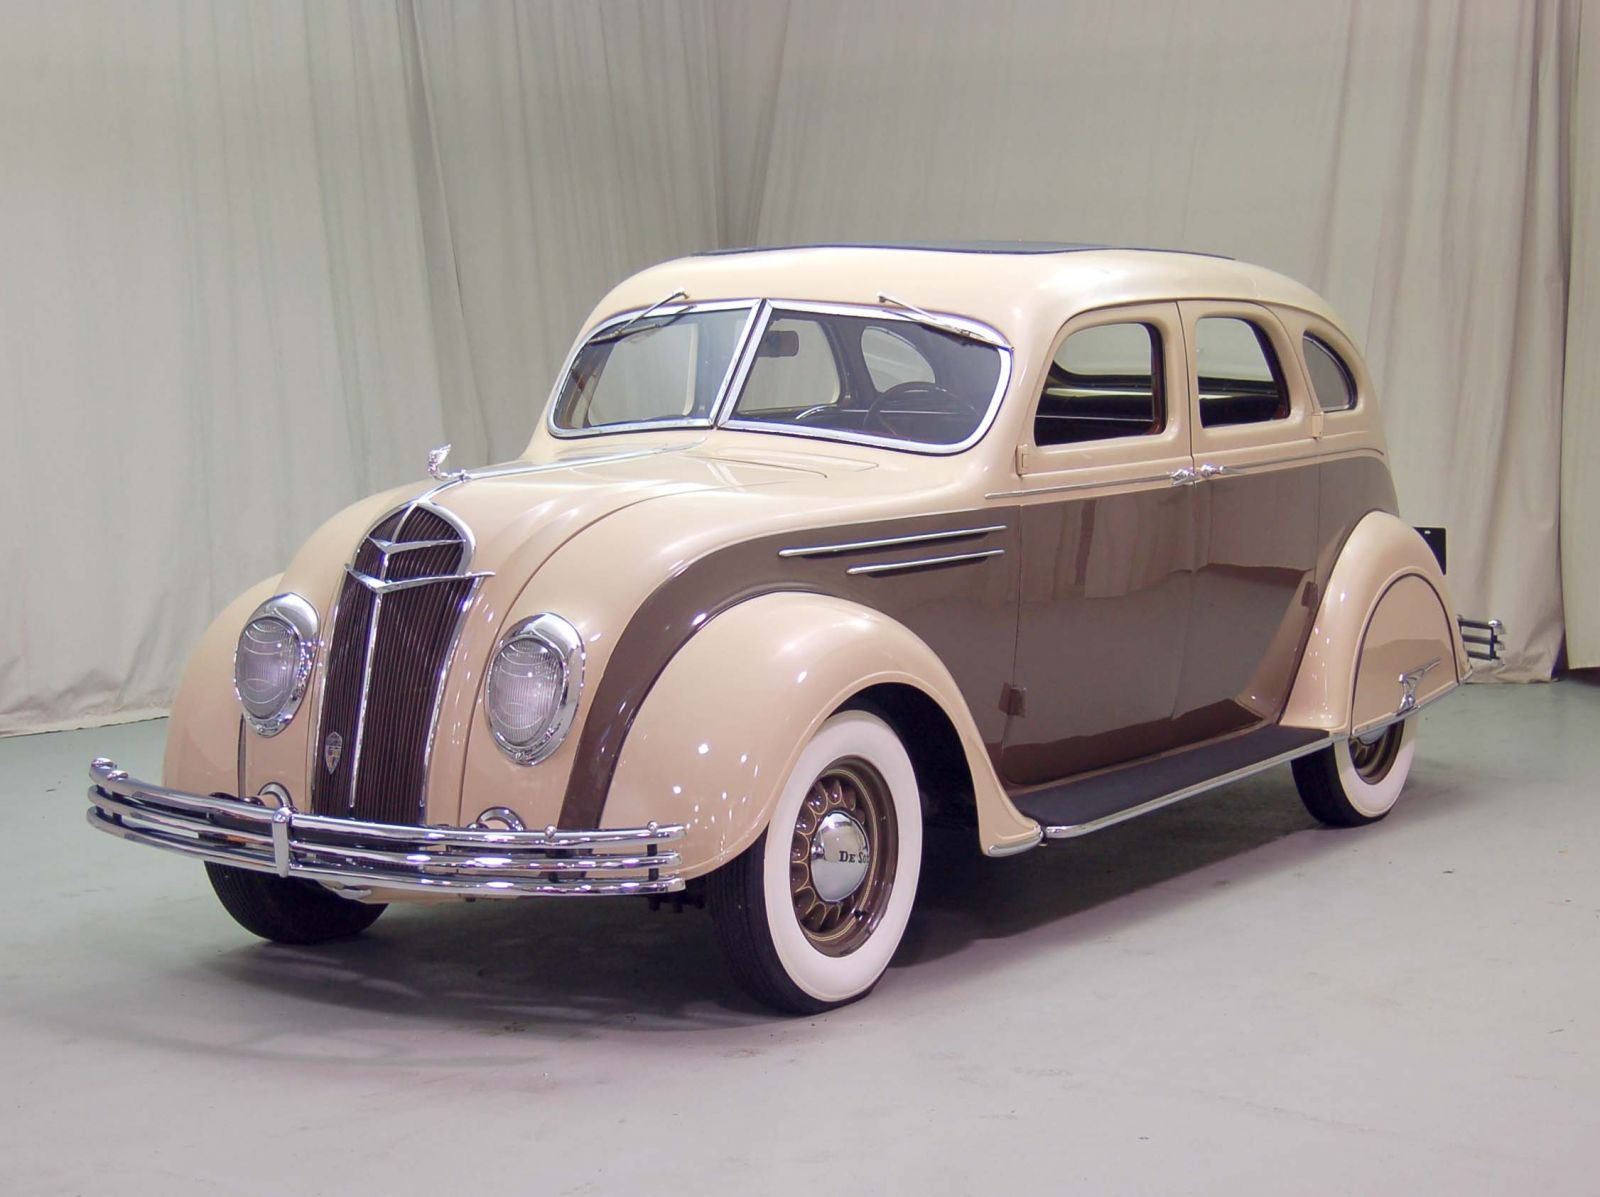 1935 DeSoto Airflow Classic Car For Sale   Buy 1935 DeSoto Airflow at Hyman LTD